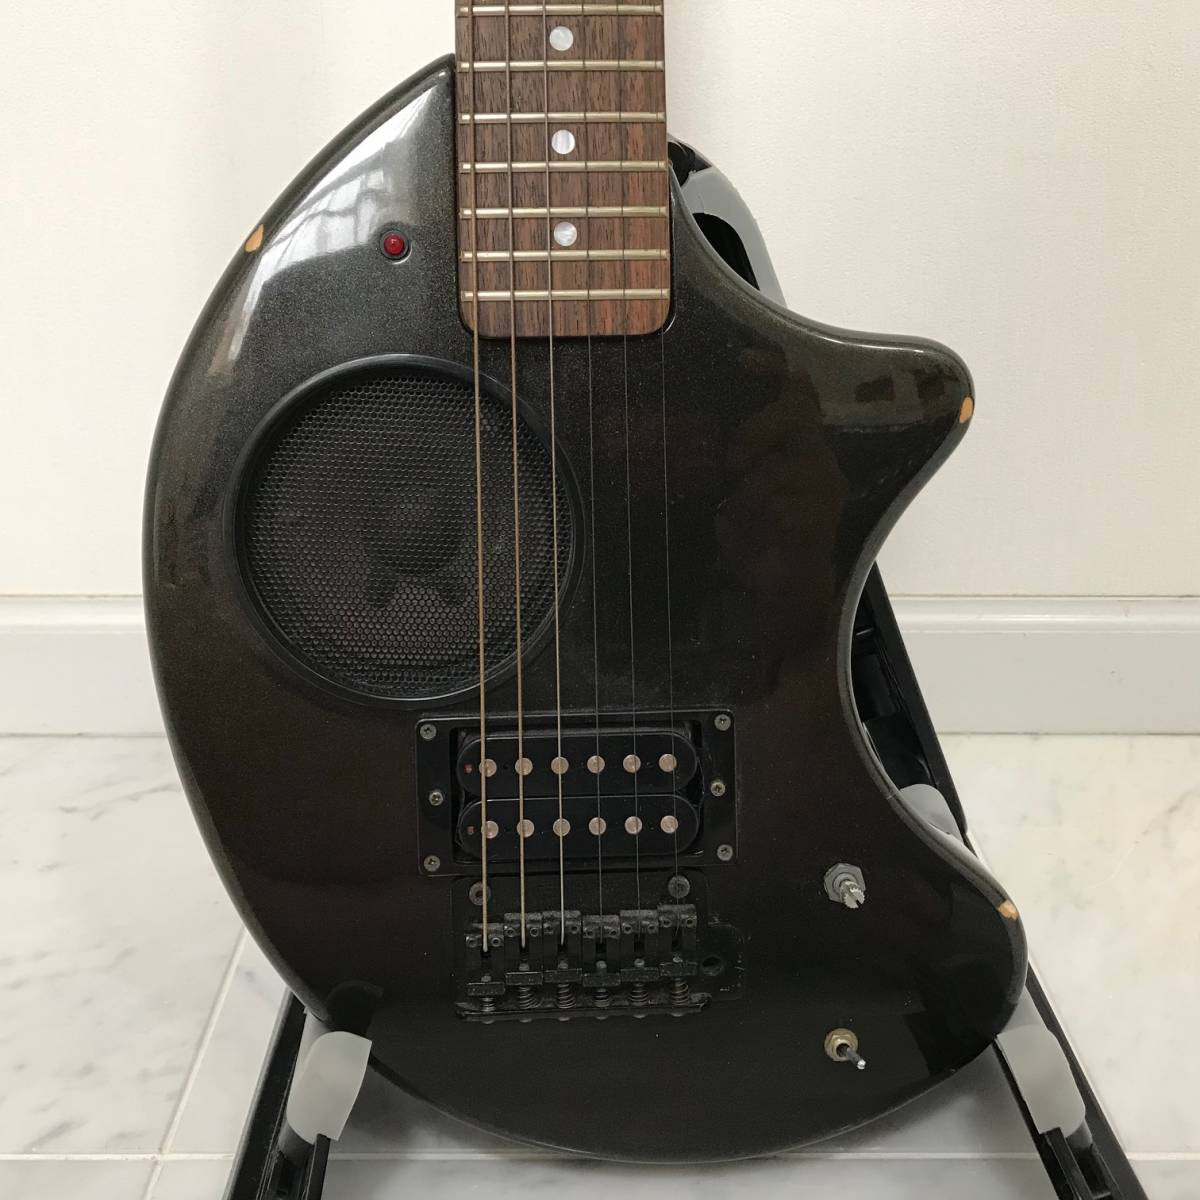 ZO-3 芸達者 ディストーション アンプ内臓 GOTOHペグ ギター ブラックメタリック ジャンク FERNANDES_画像3